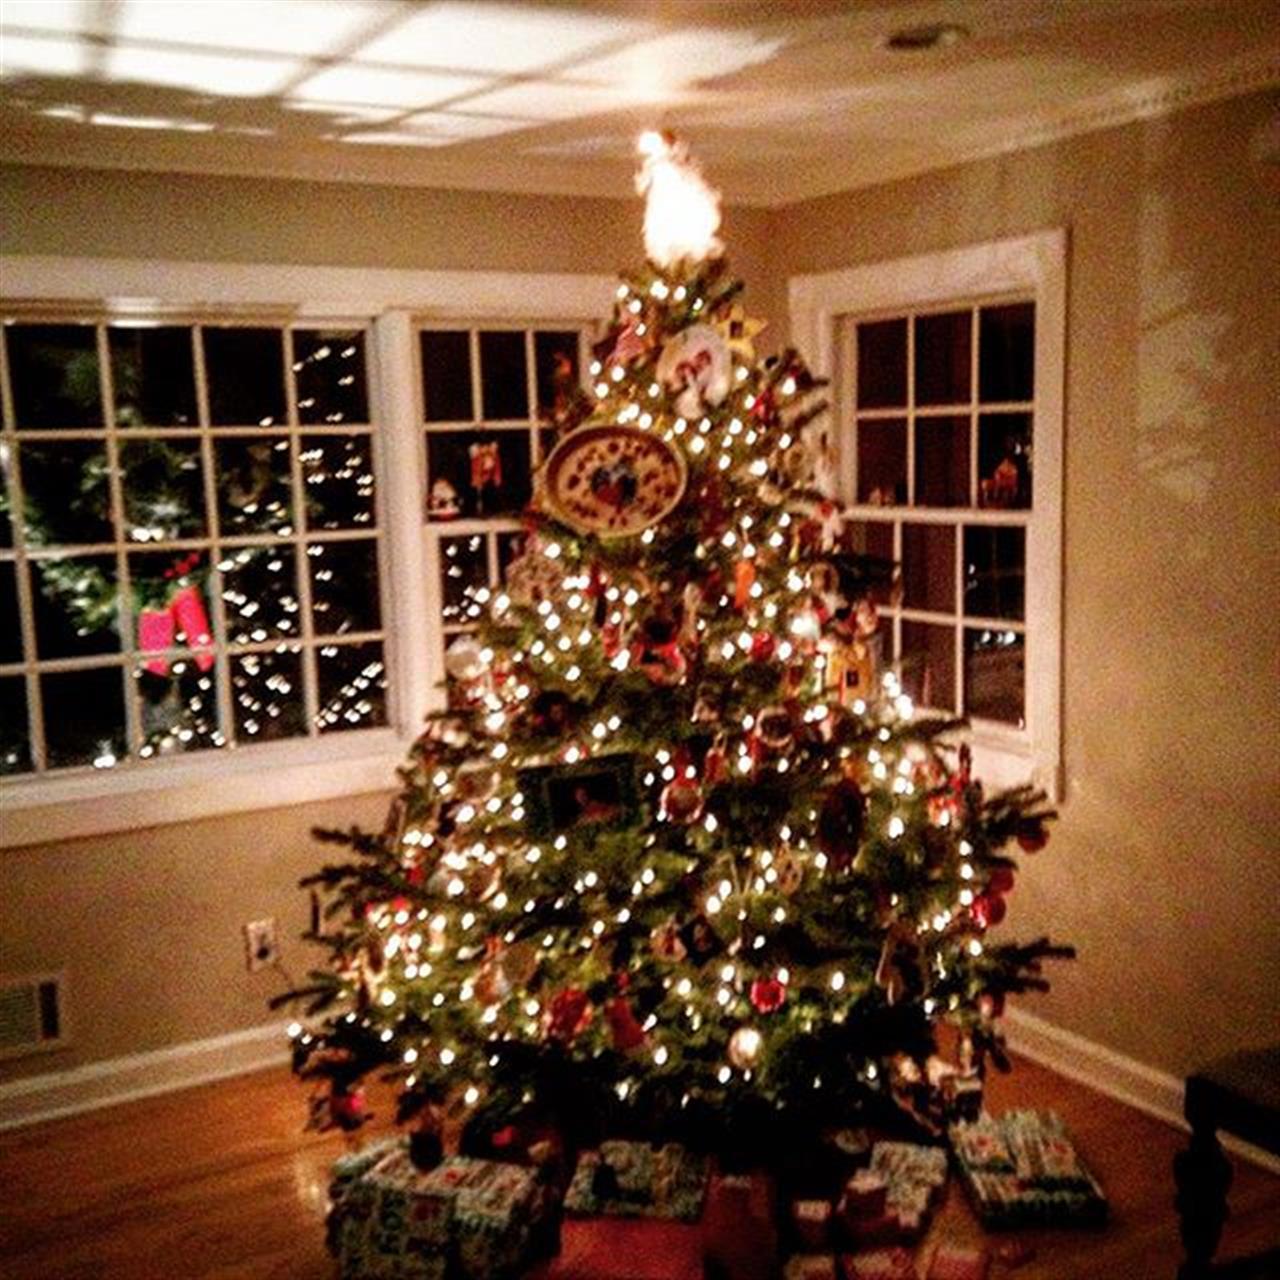 It's beginning to look a lot like Christmas! ????#christmas #wednesday #bairdhalstead #glenridgenj #veronanj #cedargrovenj #millburn #montclairnj #homesweethome #exploreyourhood #leadingrelocal #halstead #halsteadproperty #realtor #nj #xmas #brooklynwest #parkslope #christmaslights #peace #love